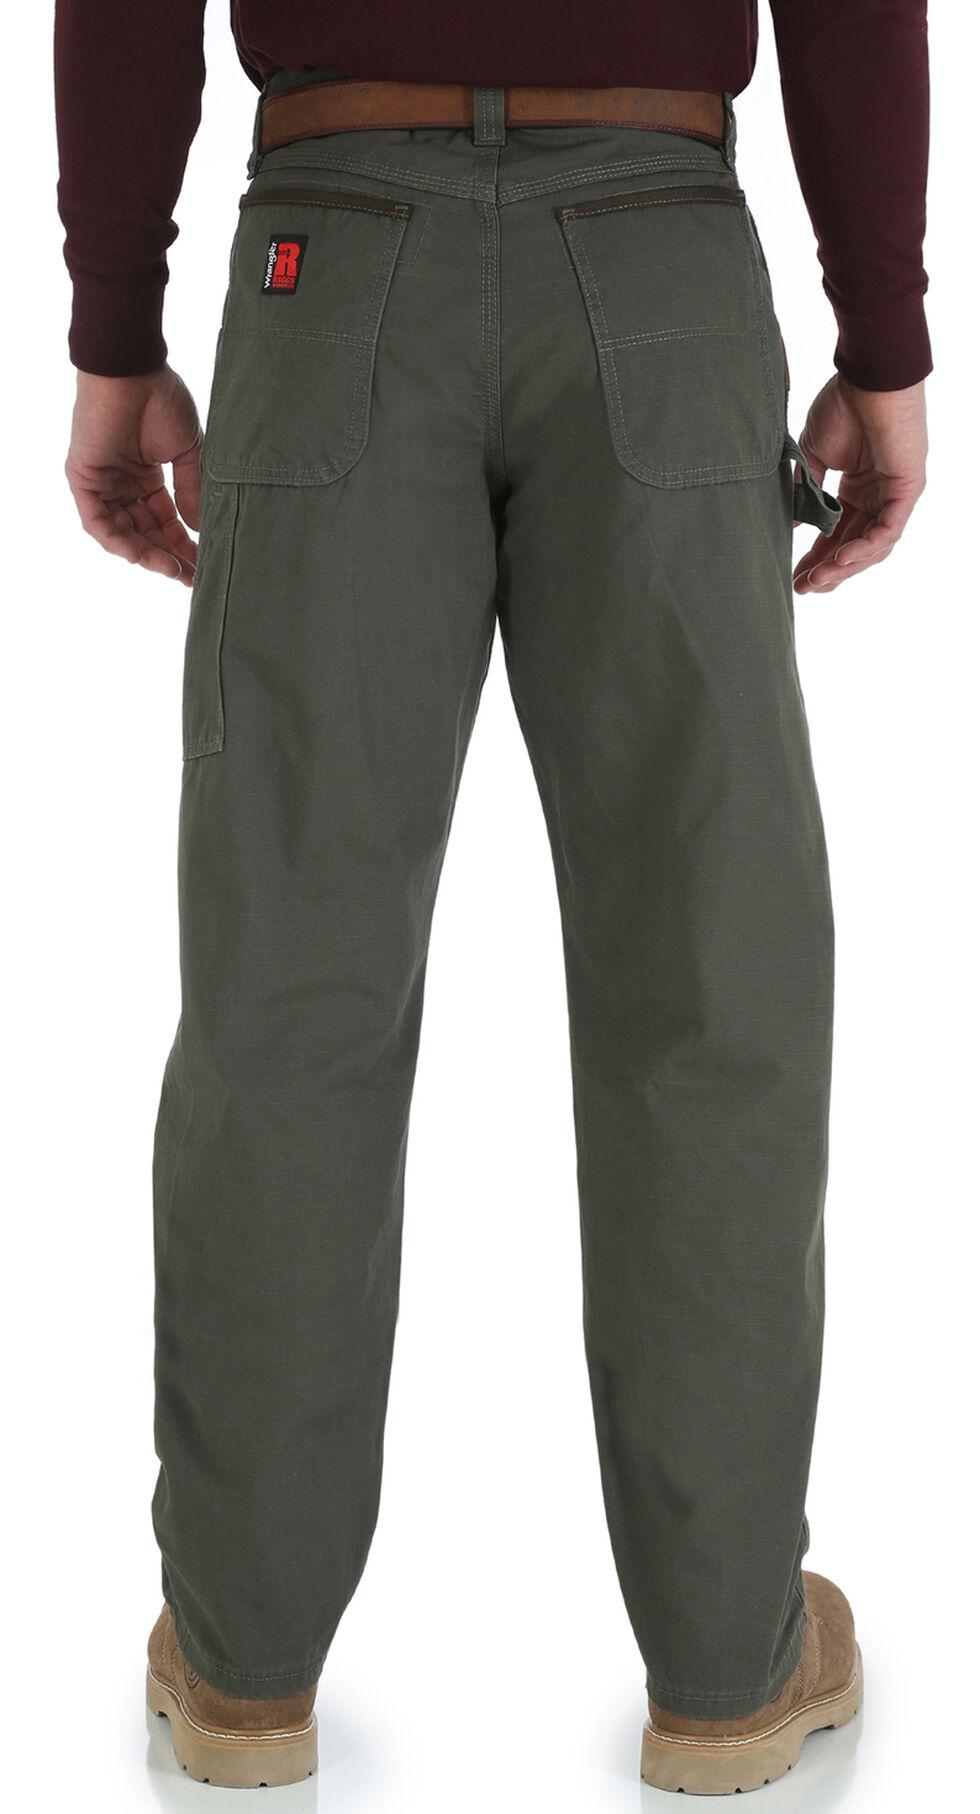 Wrangler Men's Riggs Carpenter Work Pants, Loden, hi-res